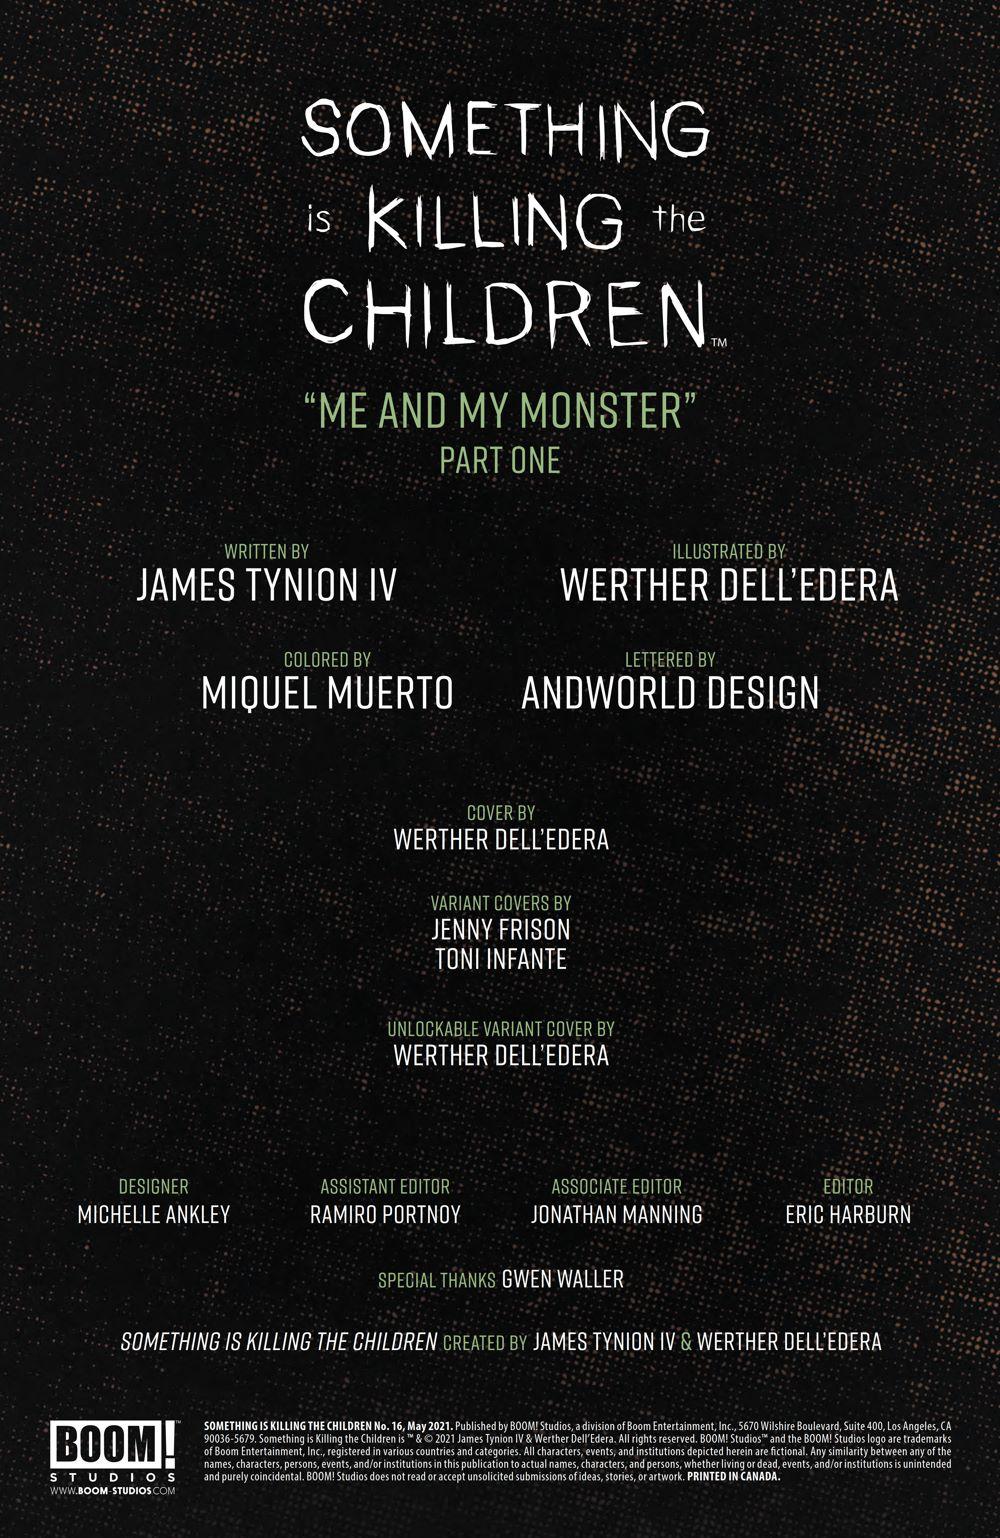 SomethingKillingChildren_016_PRESS_19 ComicList Previews: SOMETHING IS KILLING THE CHILDREN #16